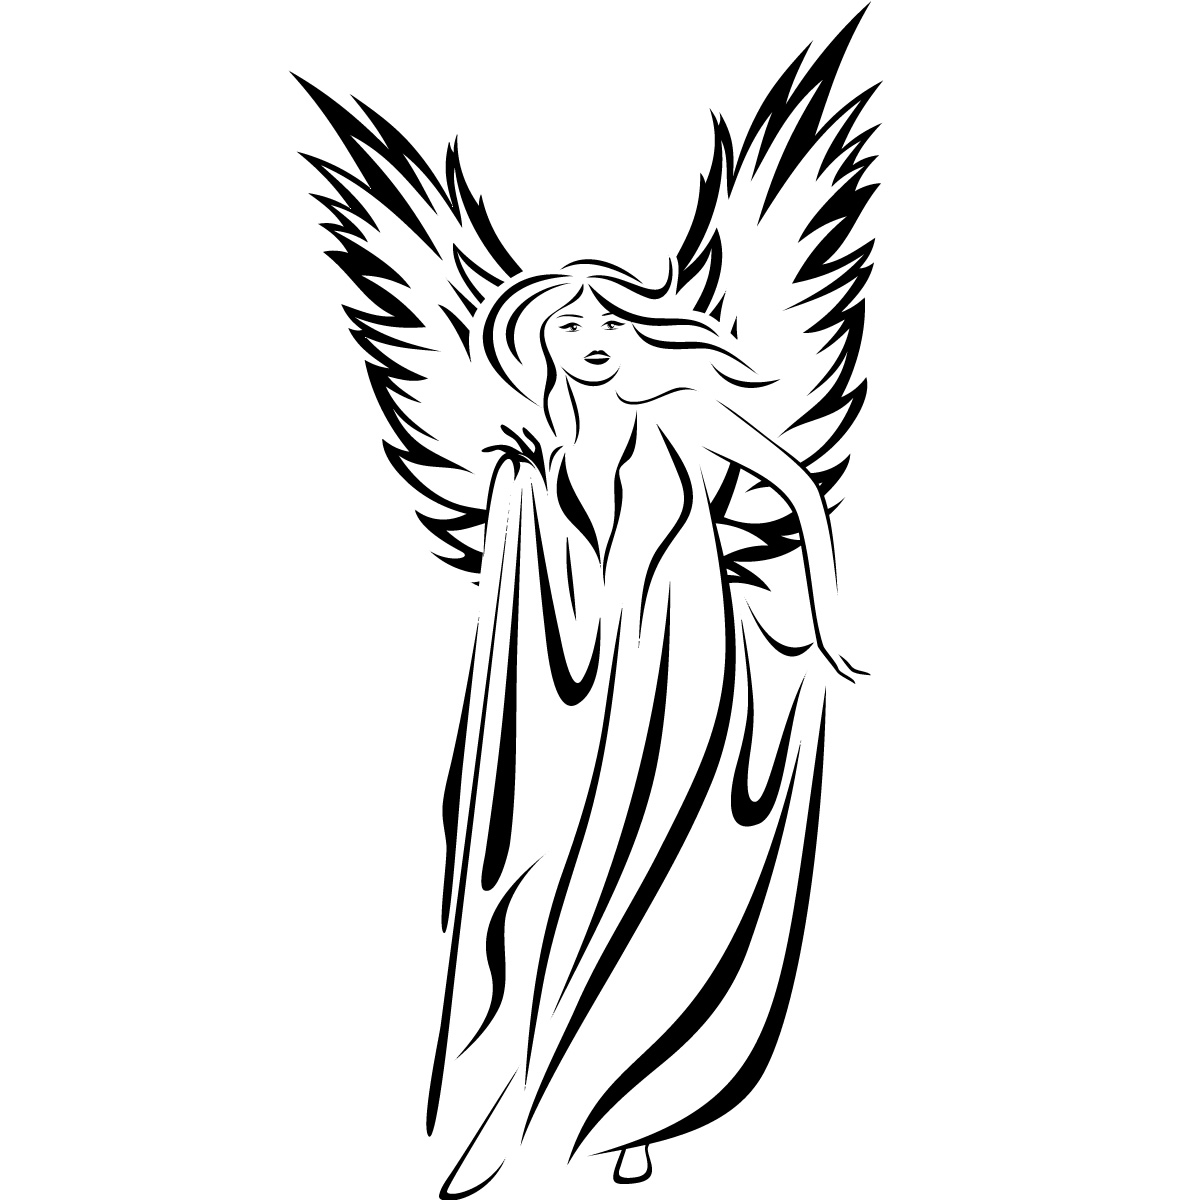 Line Drawing Angel : Angel line drawings clipart best